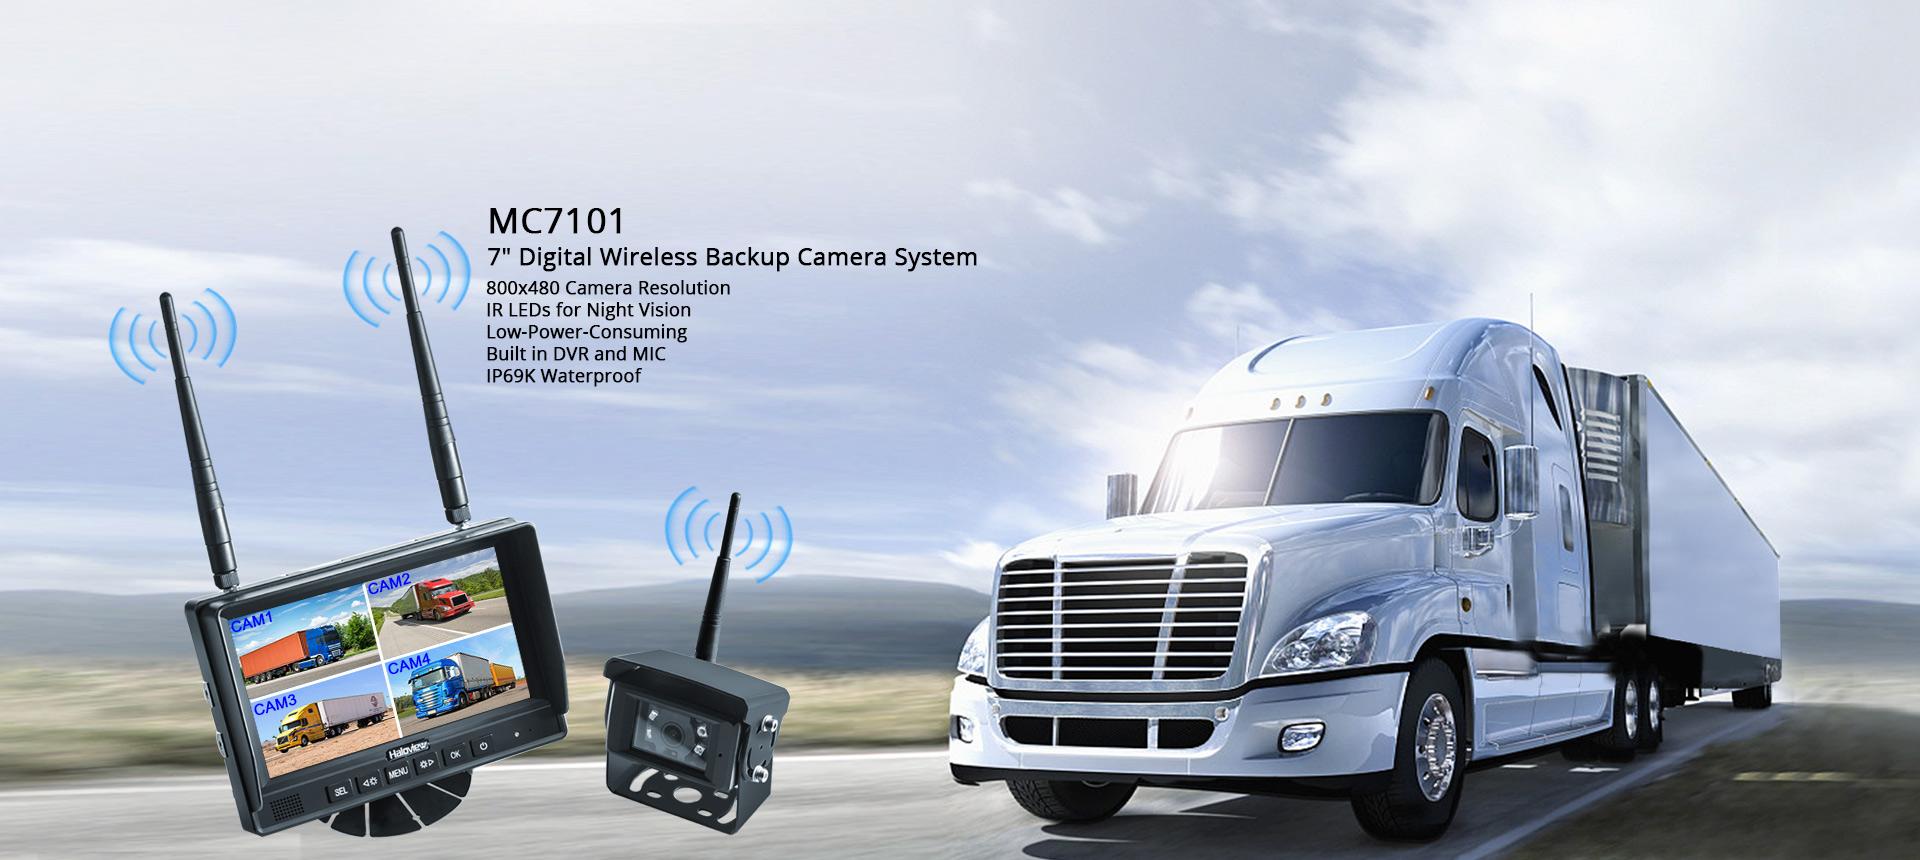 480P Digital Backup Camera System MC7101 home banner